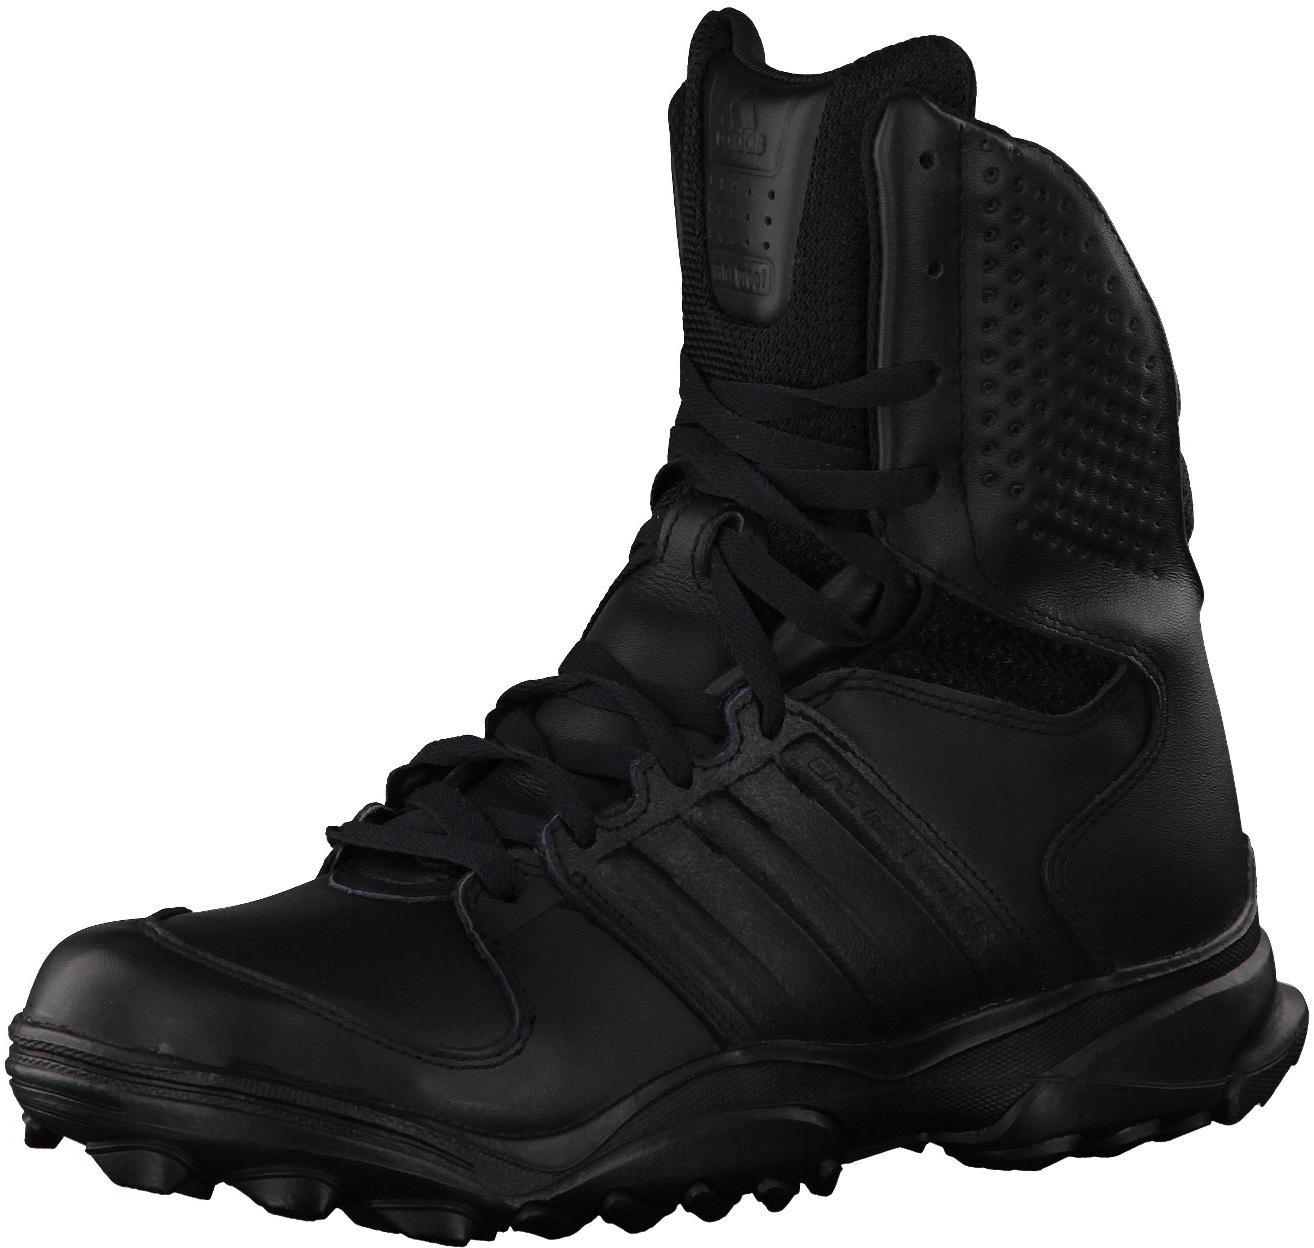 Adidas GSG9 9.2